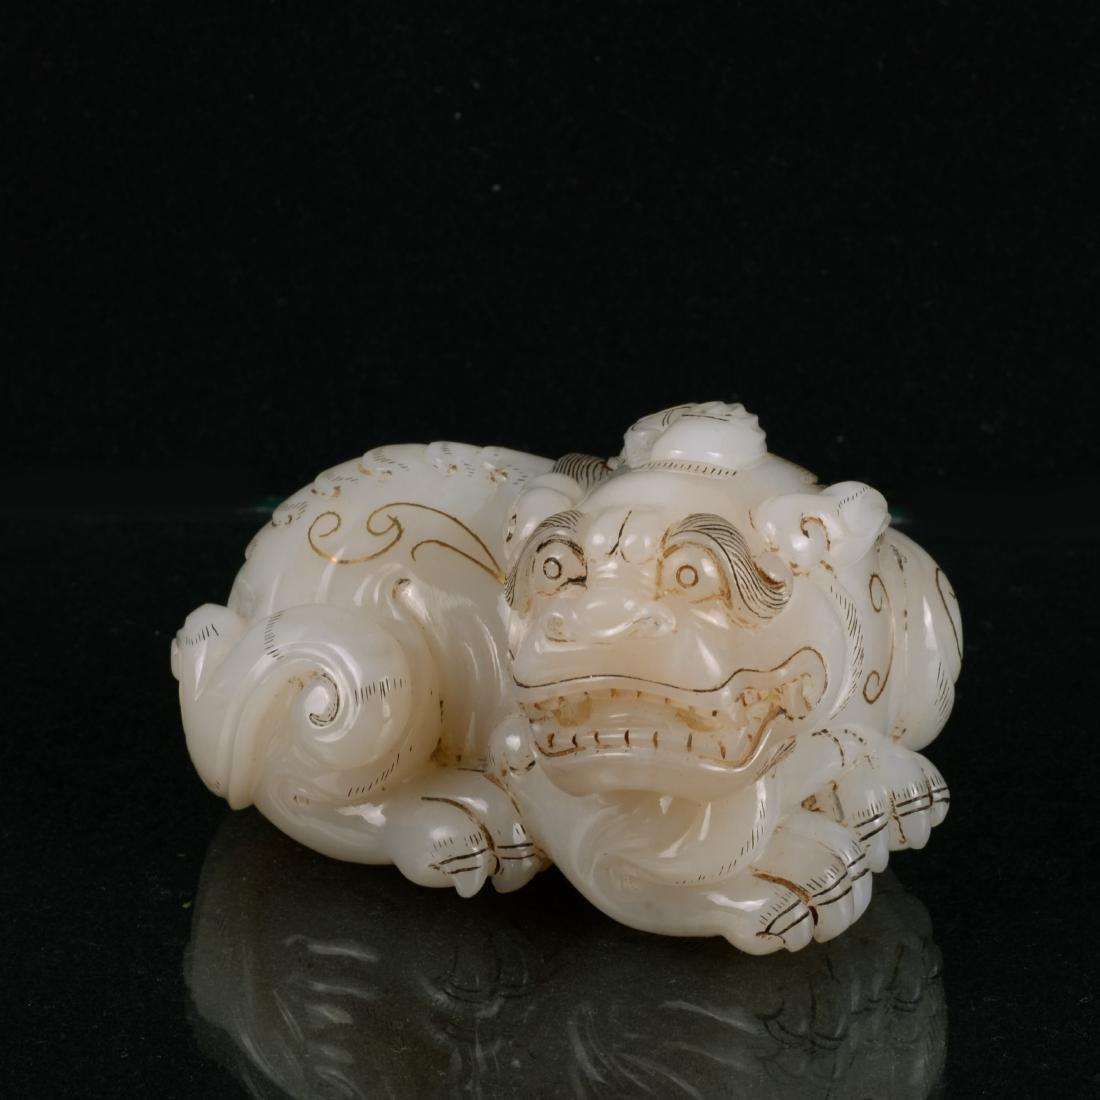 Chinese White Jade Carved QiLing